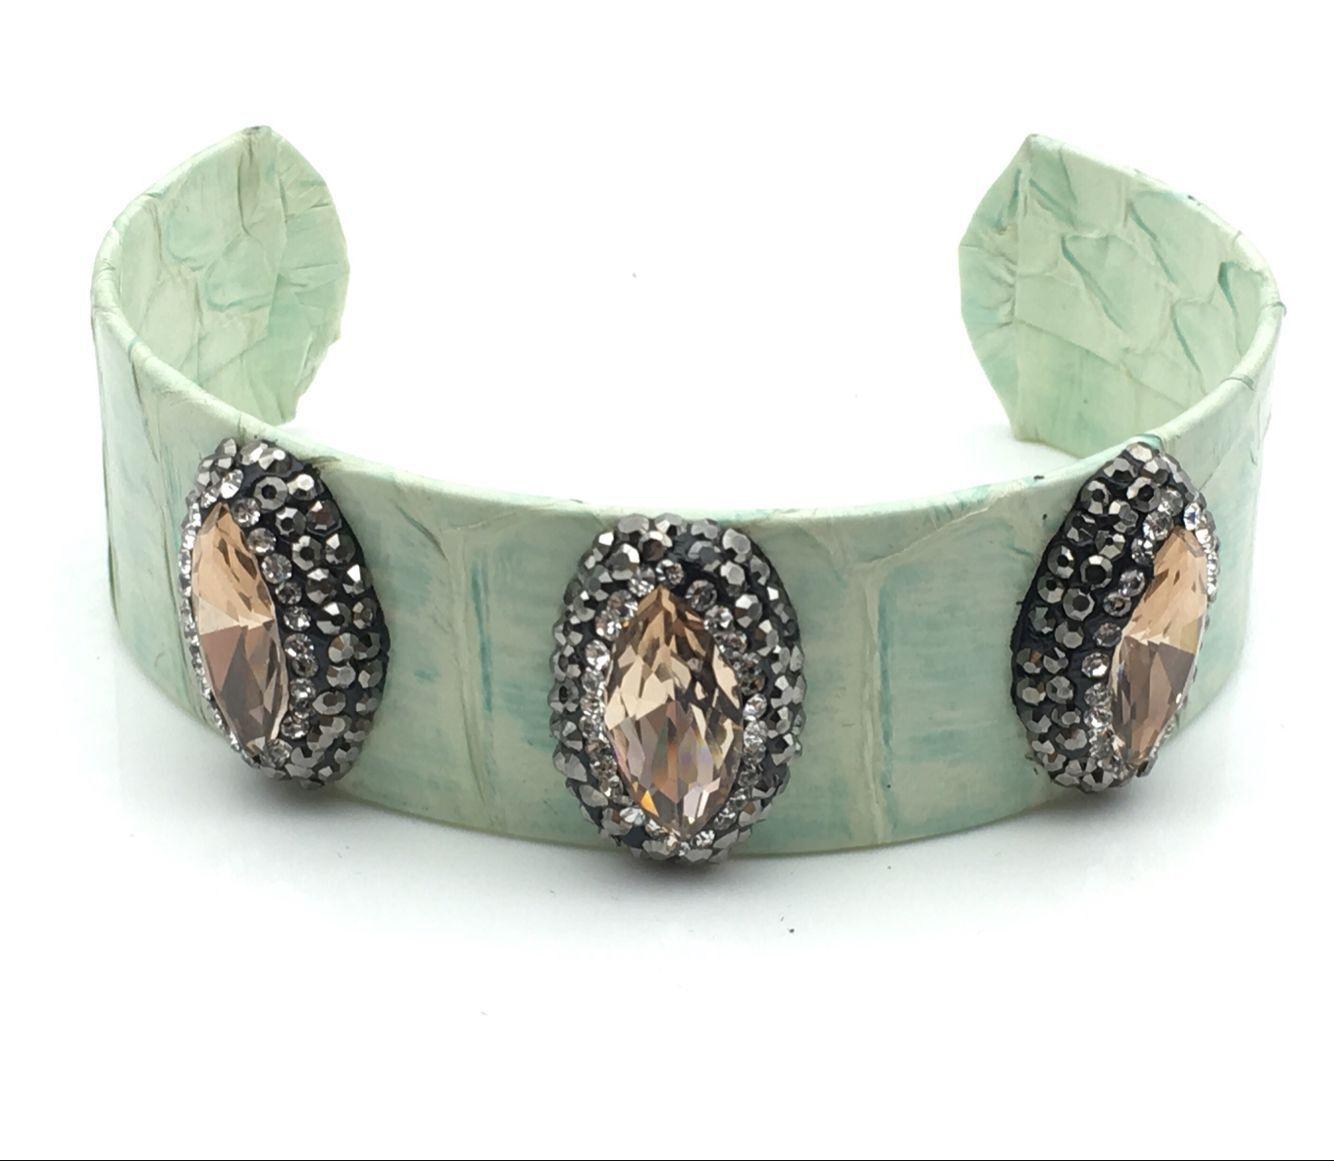 Nature Labradorite Gem stone Bangle Cuff with Snakeskin Wrap in Pave Crystal Labradorite Bangles Jewelry